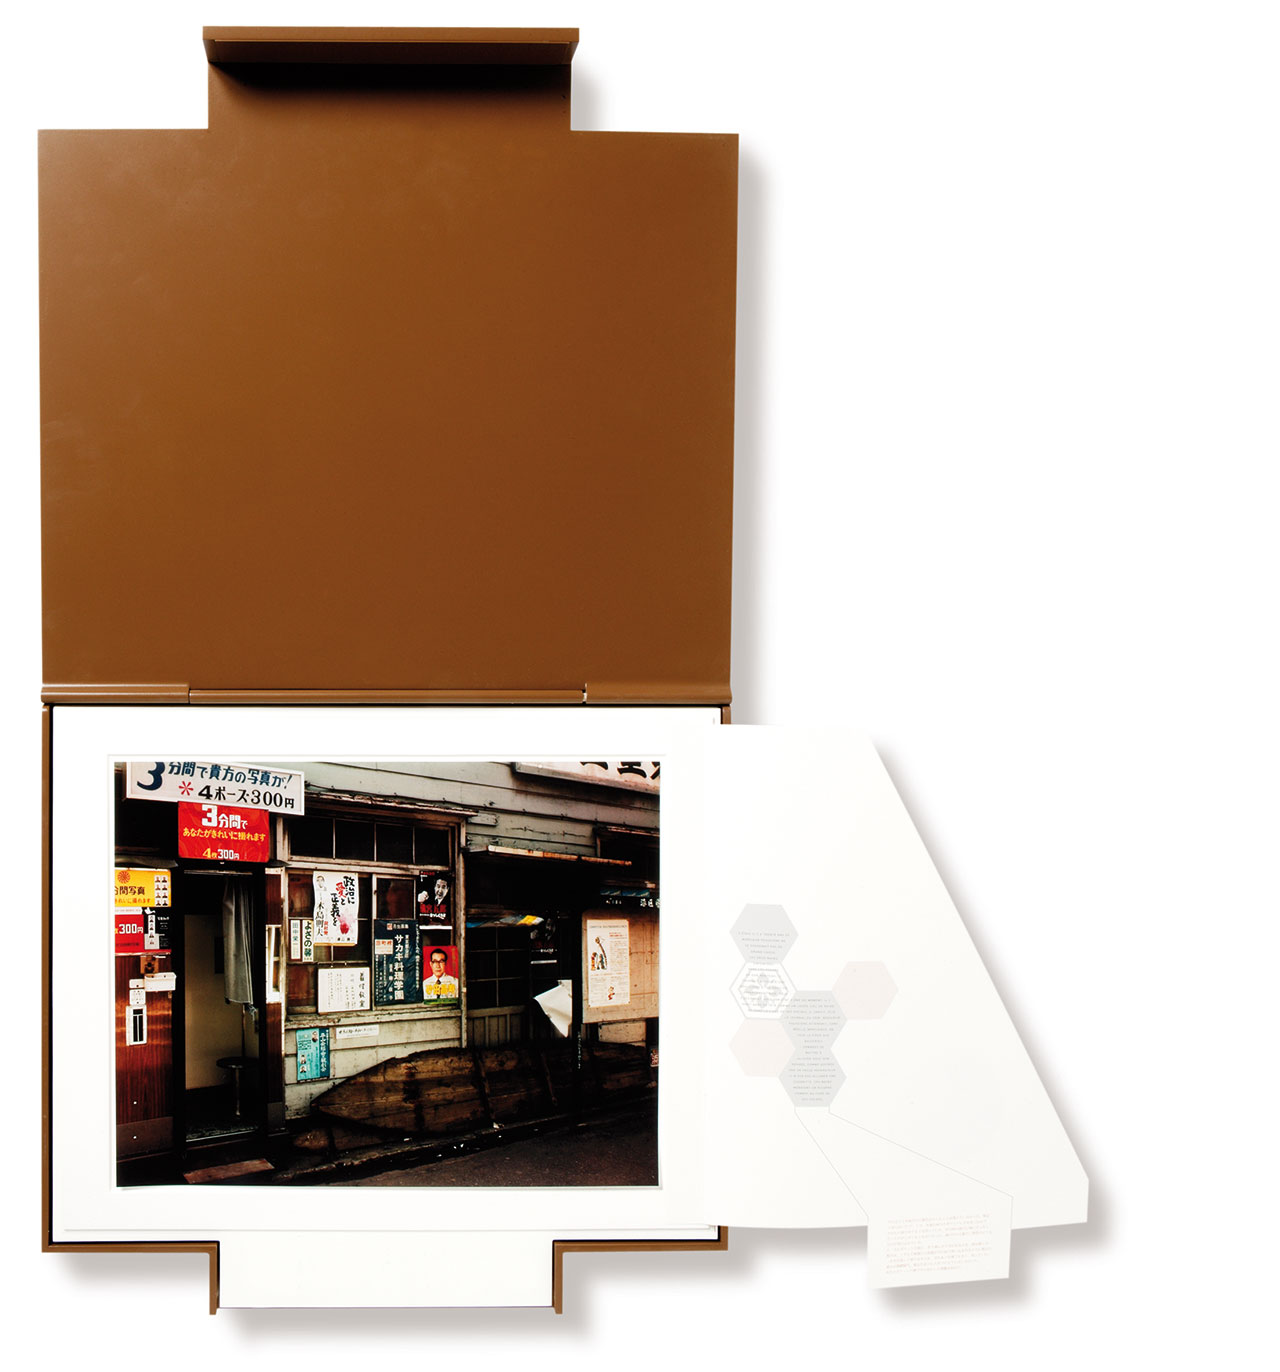 Yutaka Takanashi 高梨 豊 (photos), Michel Bulteau (text), Olivier Andreotti (case), No One, 2007 (48 x 51,7 x 4,8 cm)